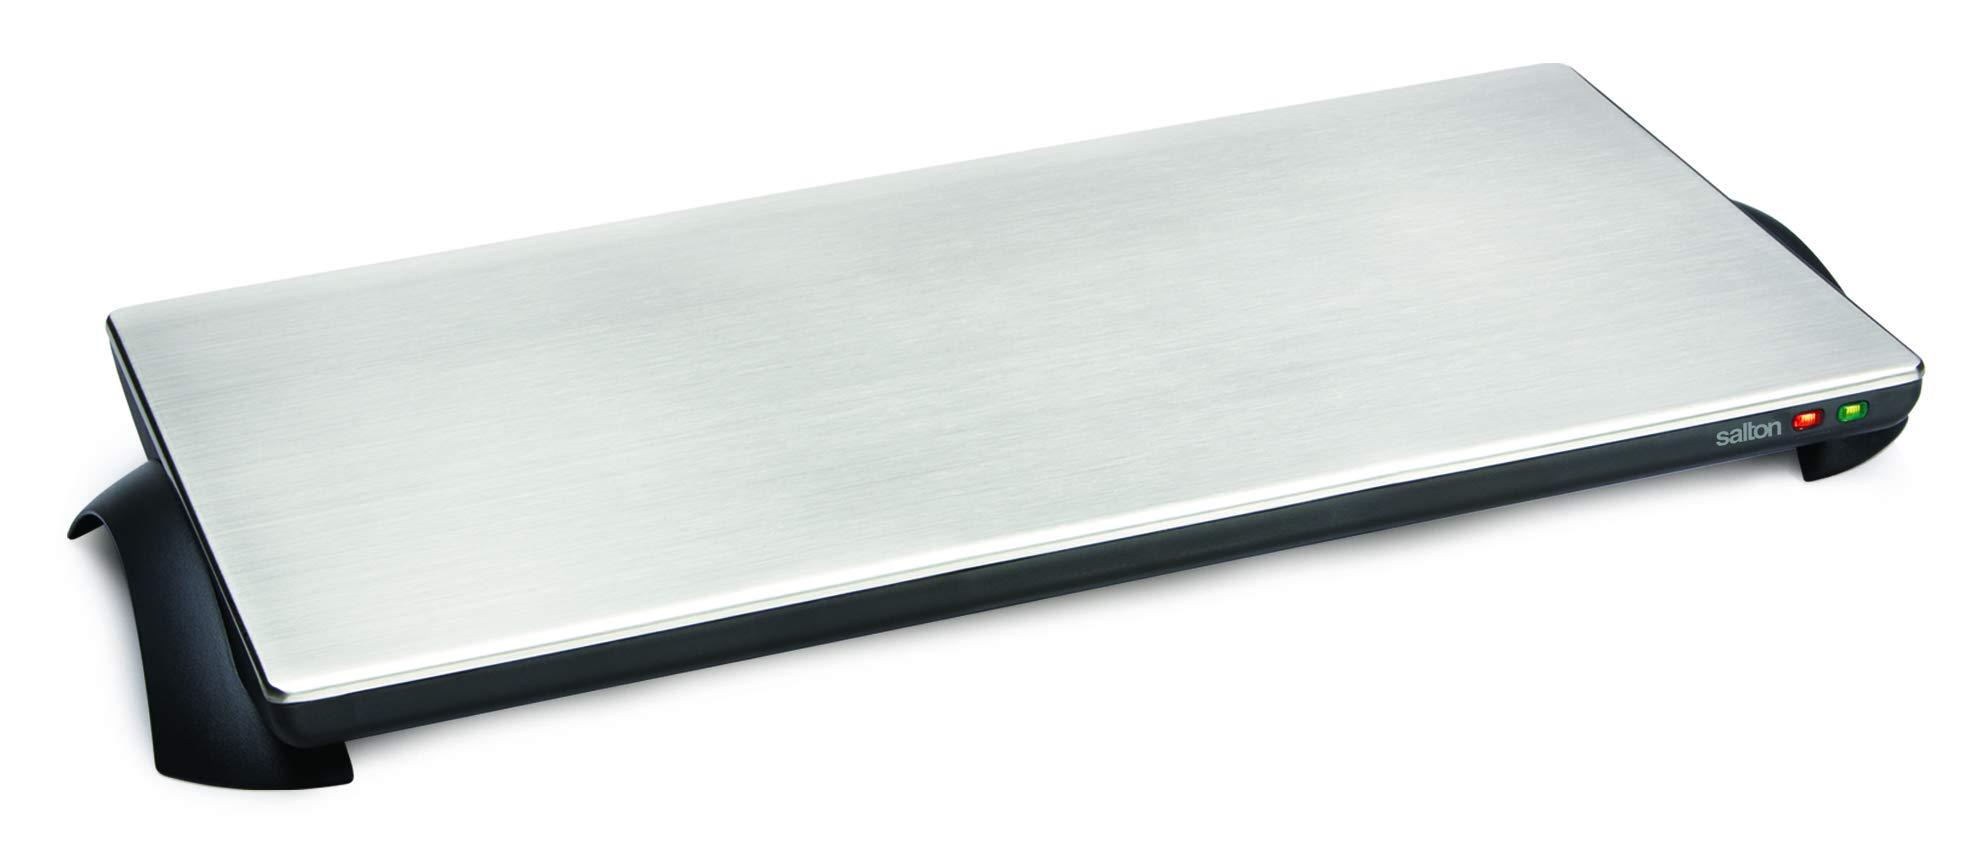 Salton TWT 40 Silhouette 1000 Watt Stainless Steel